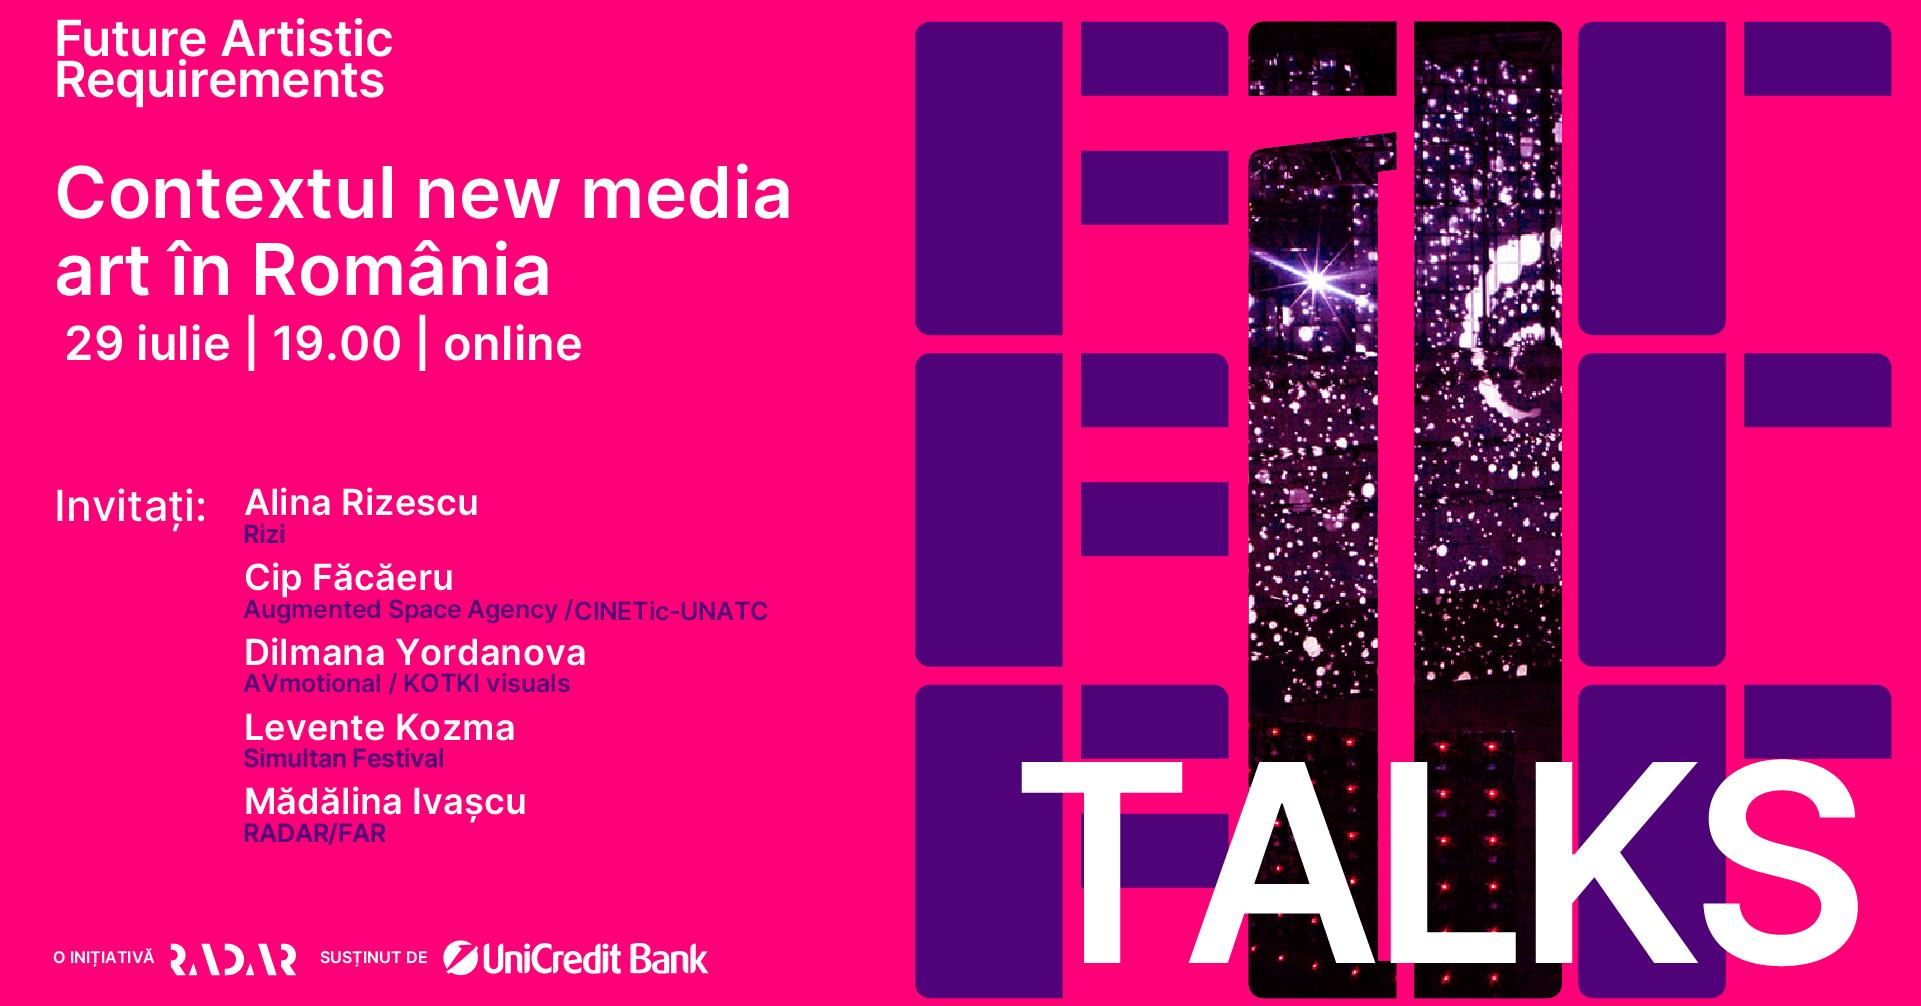 FAR TALKS – Contextul new media art în România